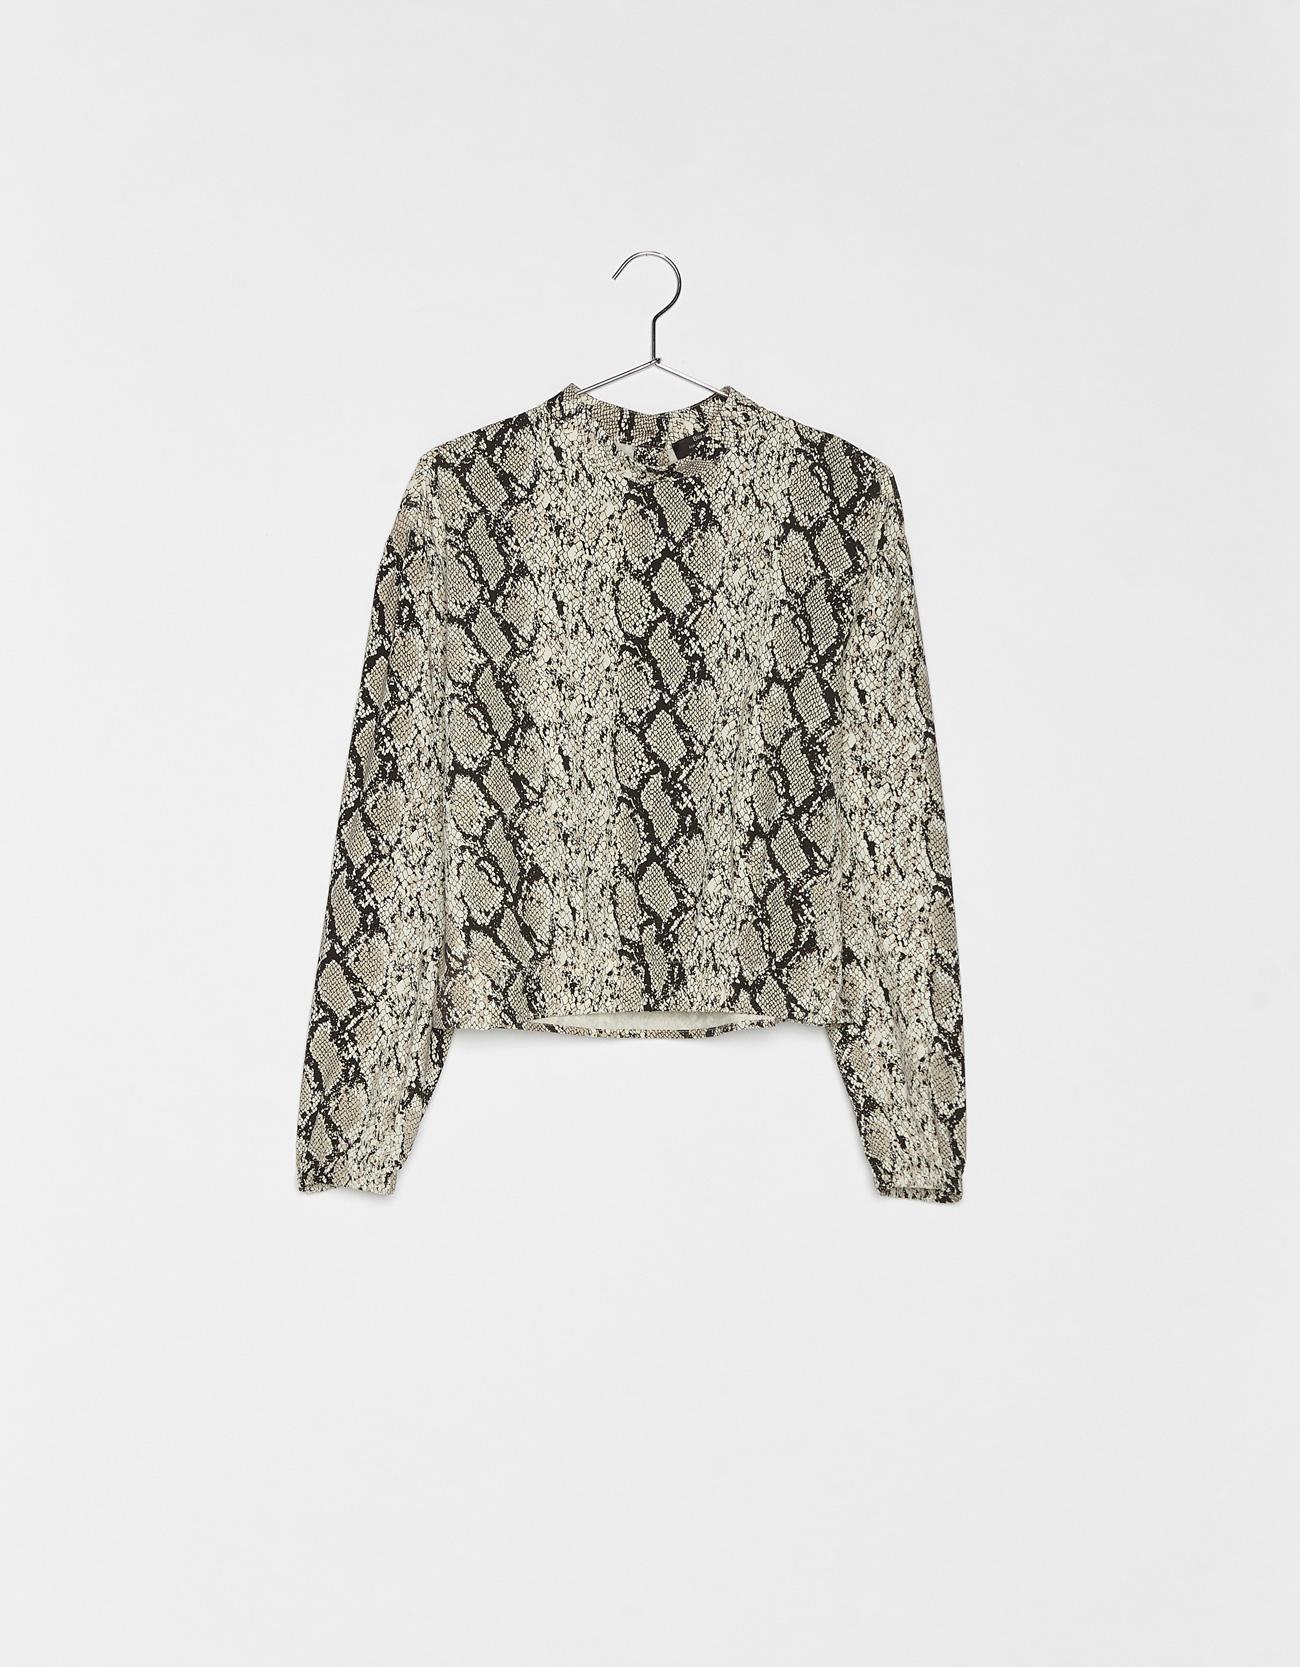 64cfd76e39 Snakeskin print blouse - New - Bershka Greece